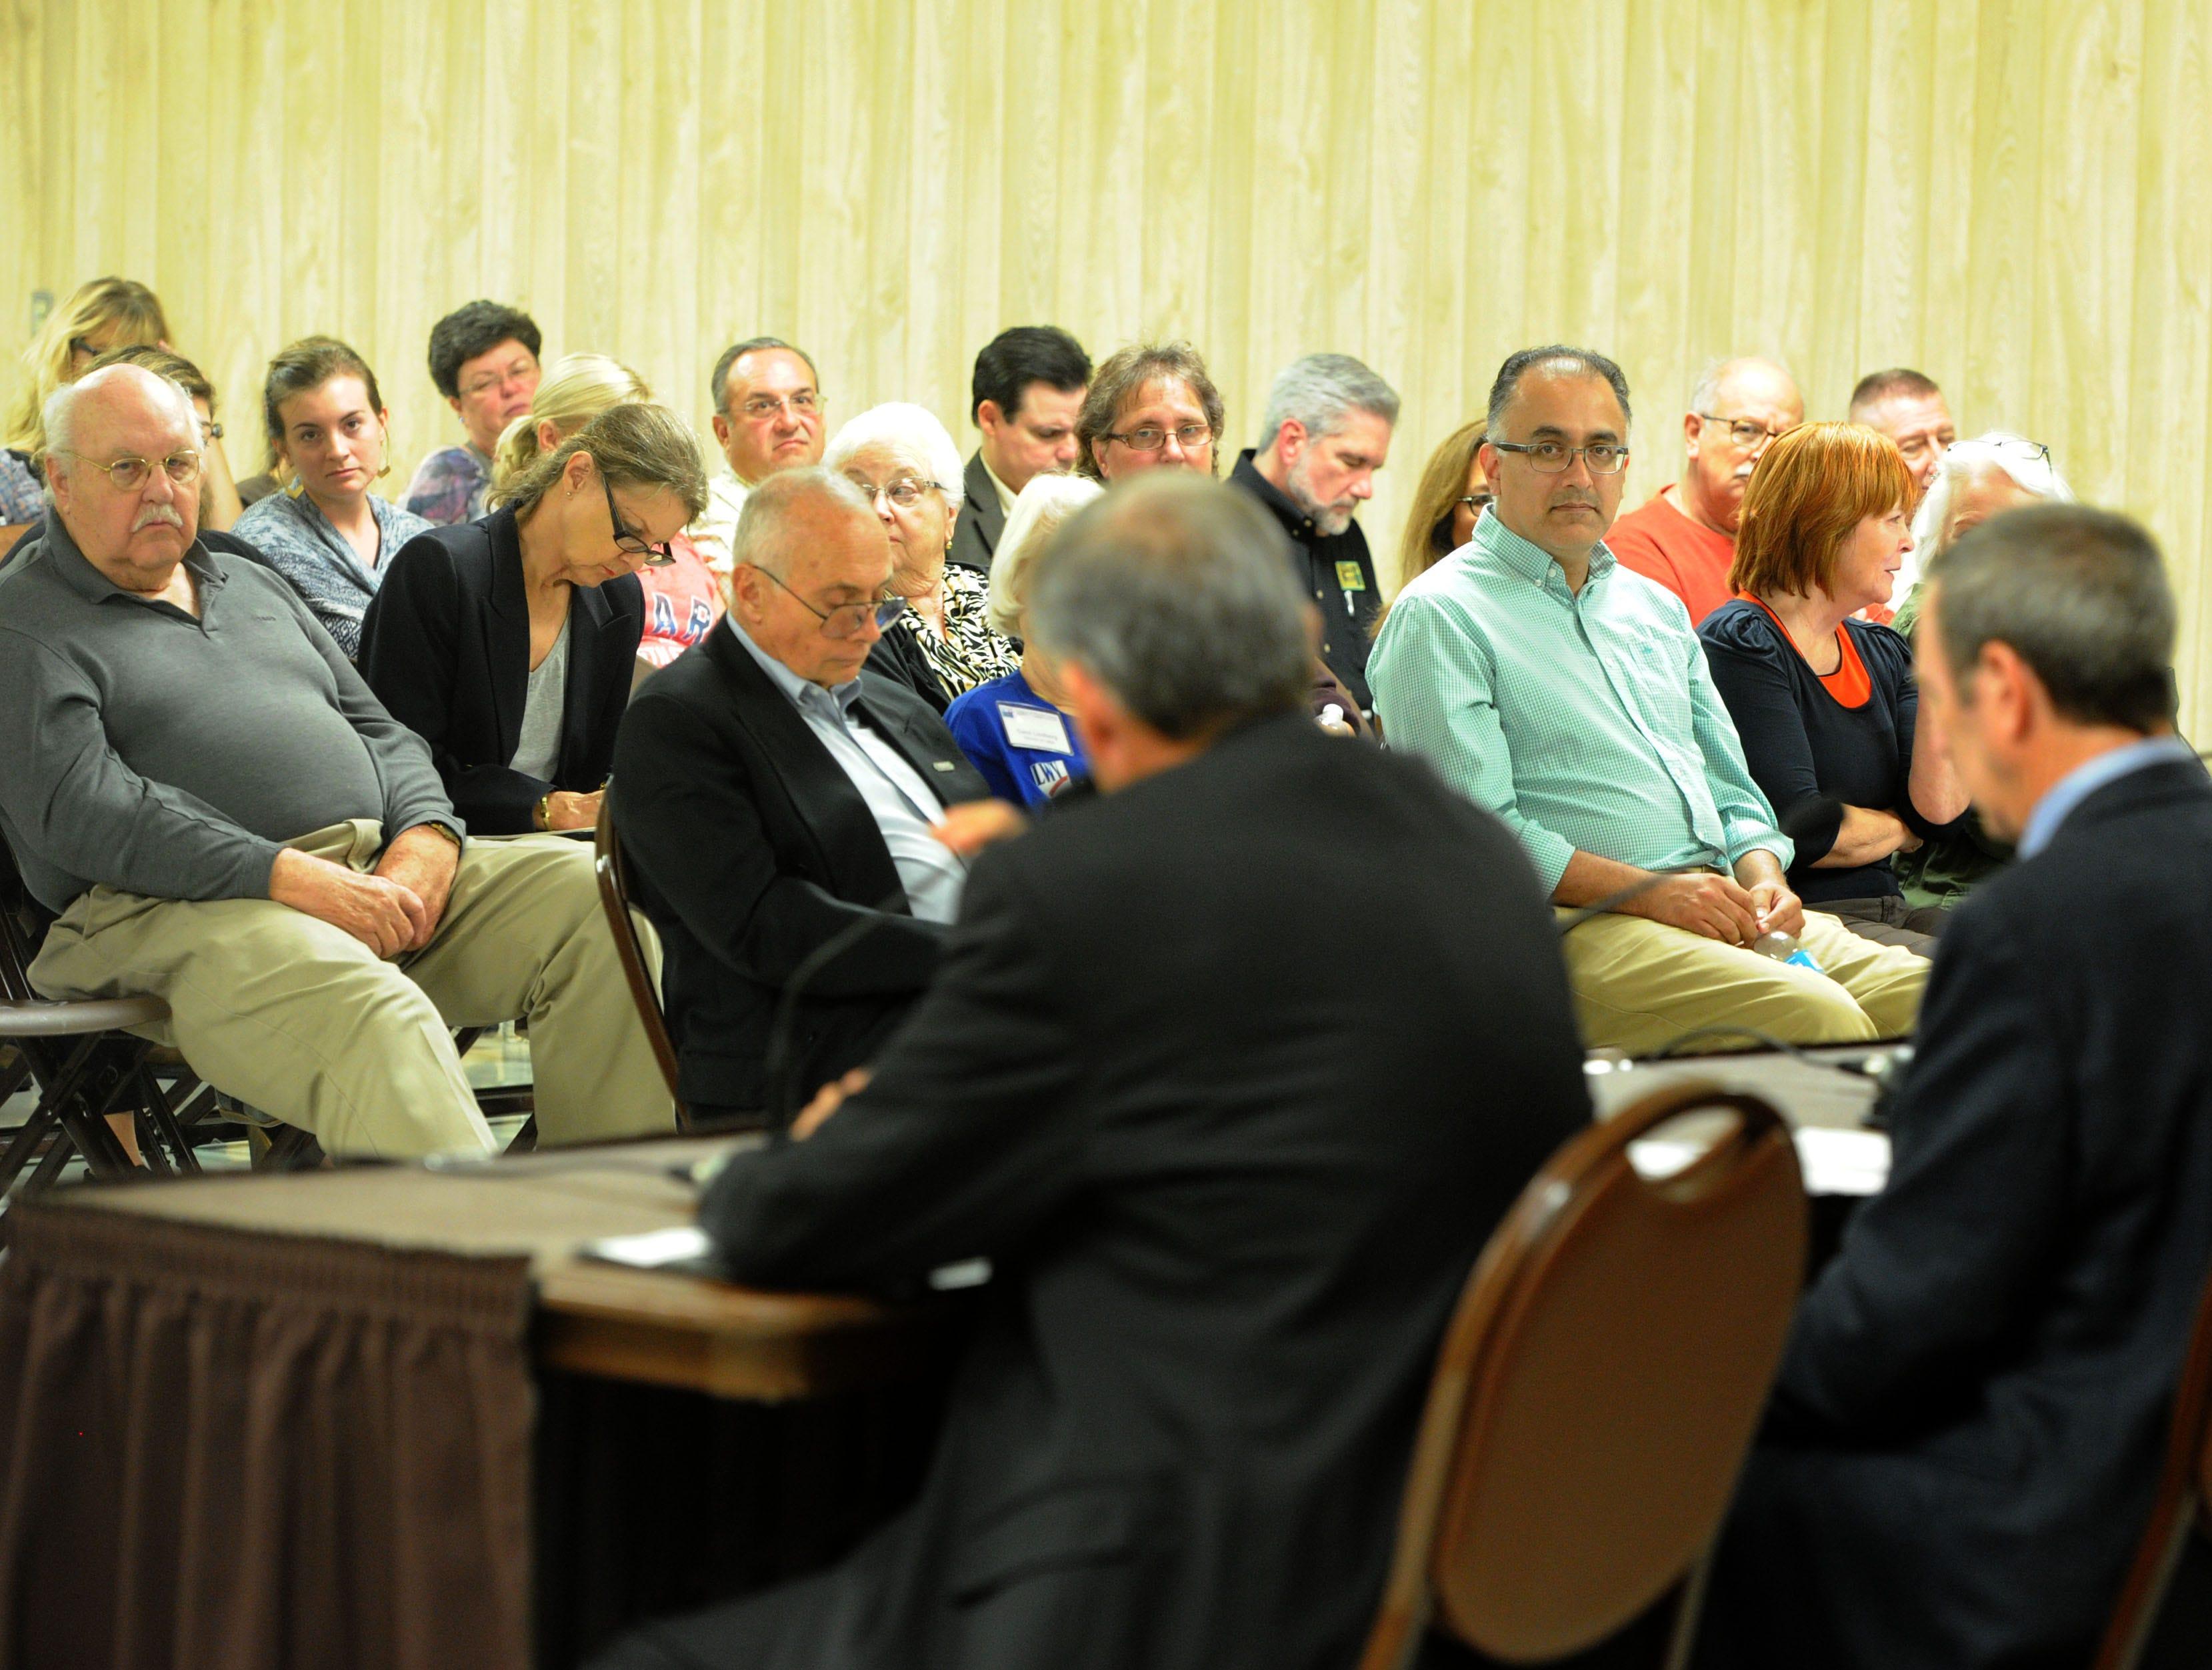 A candidates forum for Santa Paula City Council draws a crowd.